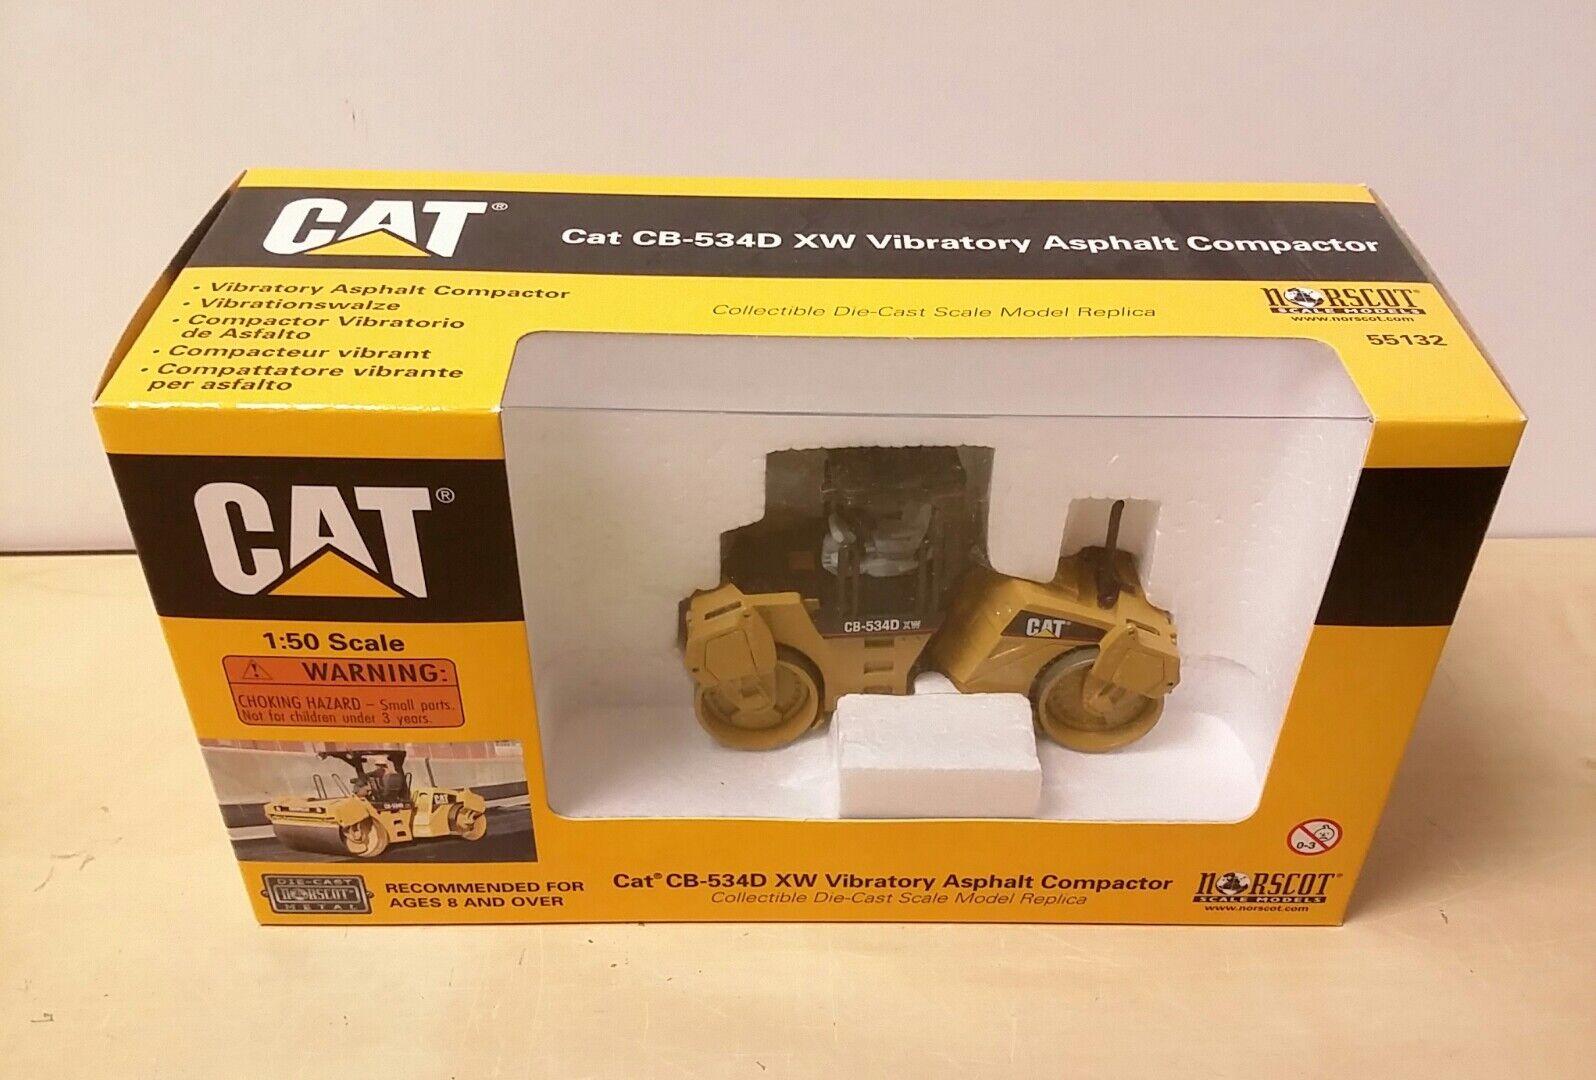 Norscot Caterpillar CB-534D XW Vibratory Asphalt Compactor Brand New 1 50 Scale